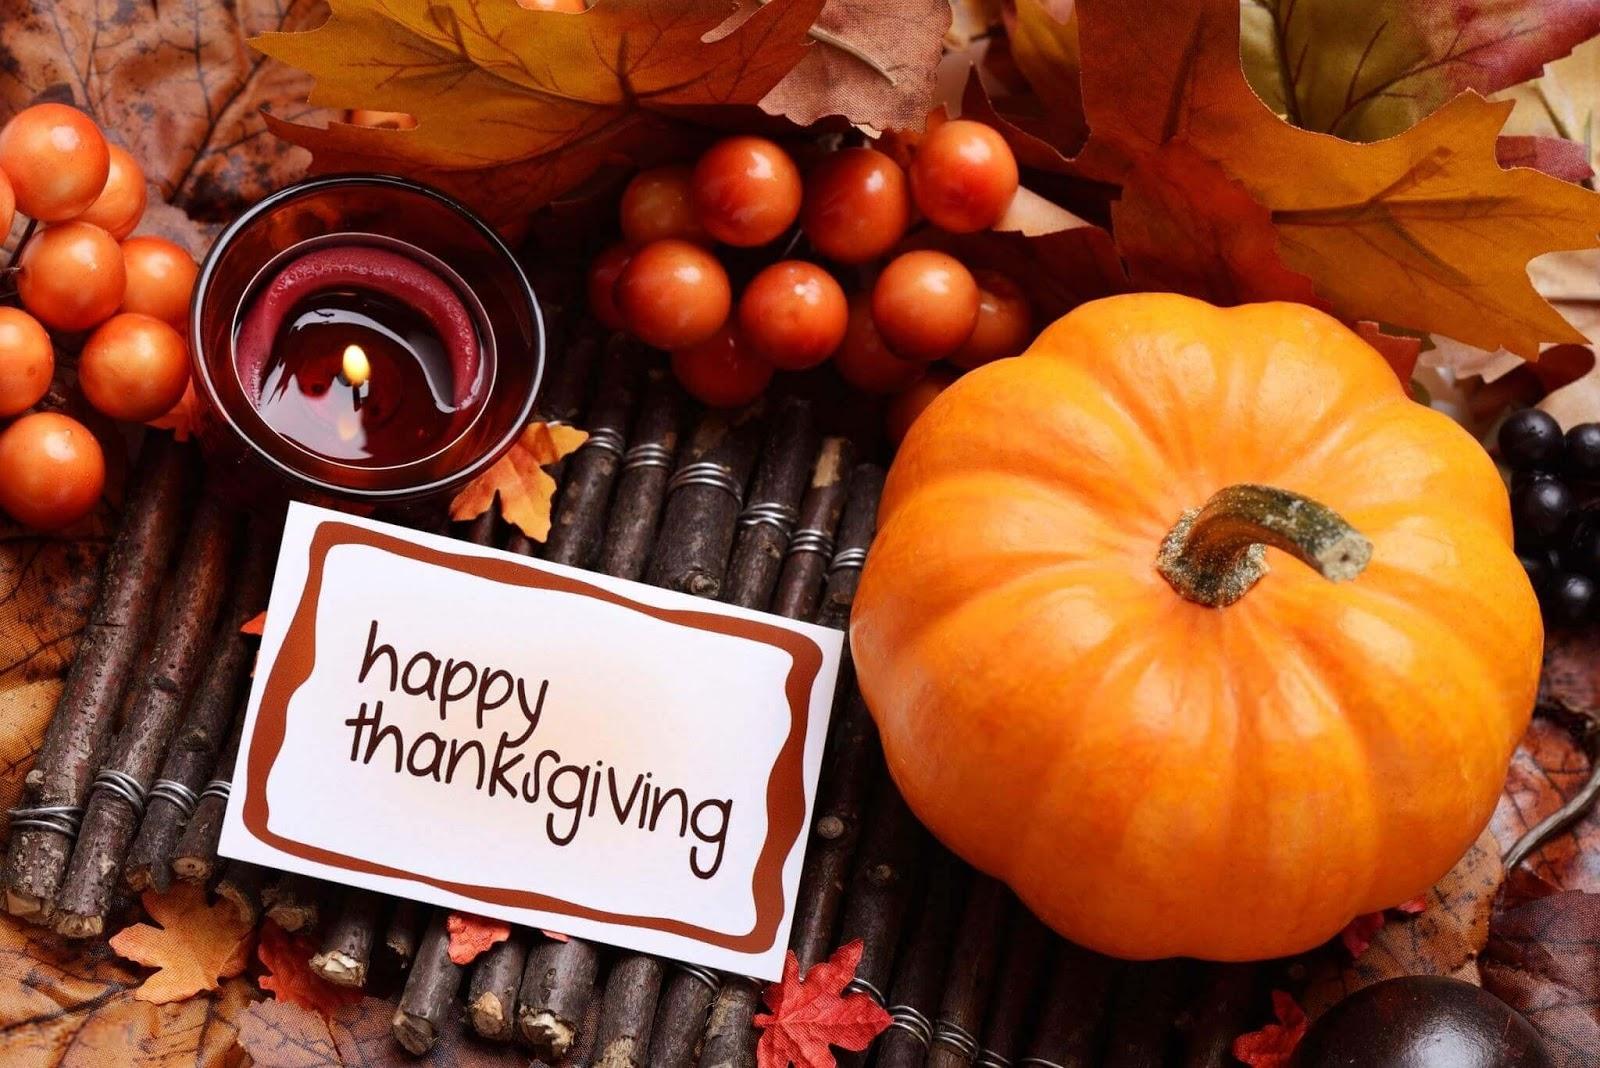 Happy Thanksgiving Wallpaper, Thanksgiving Wallpaper Hd